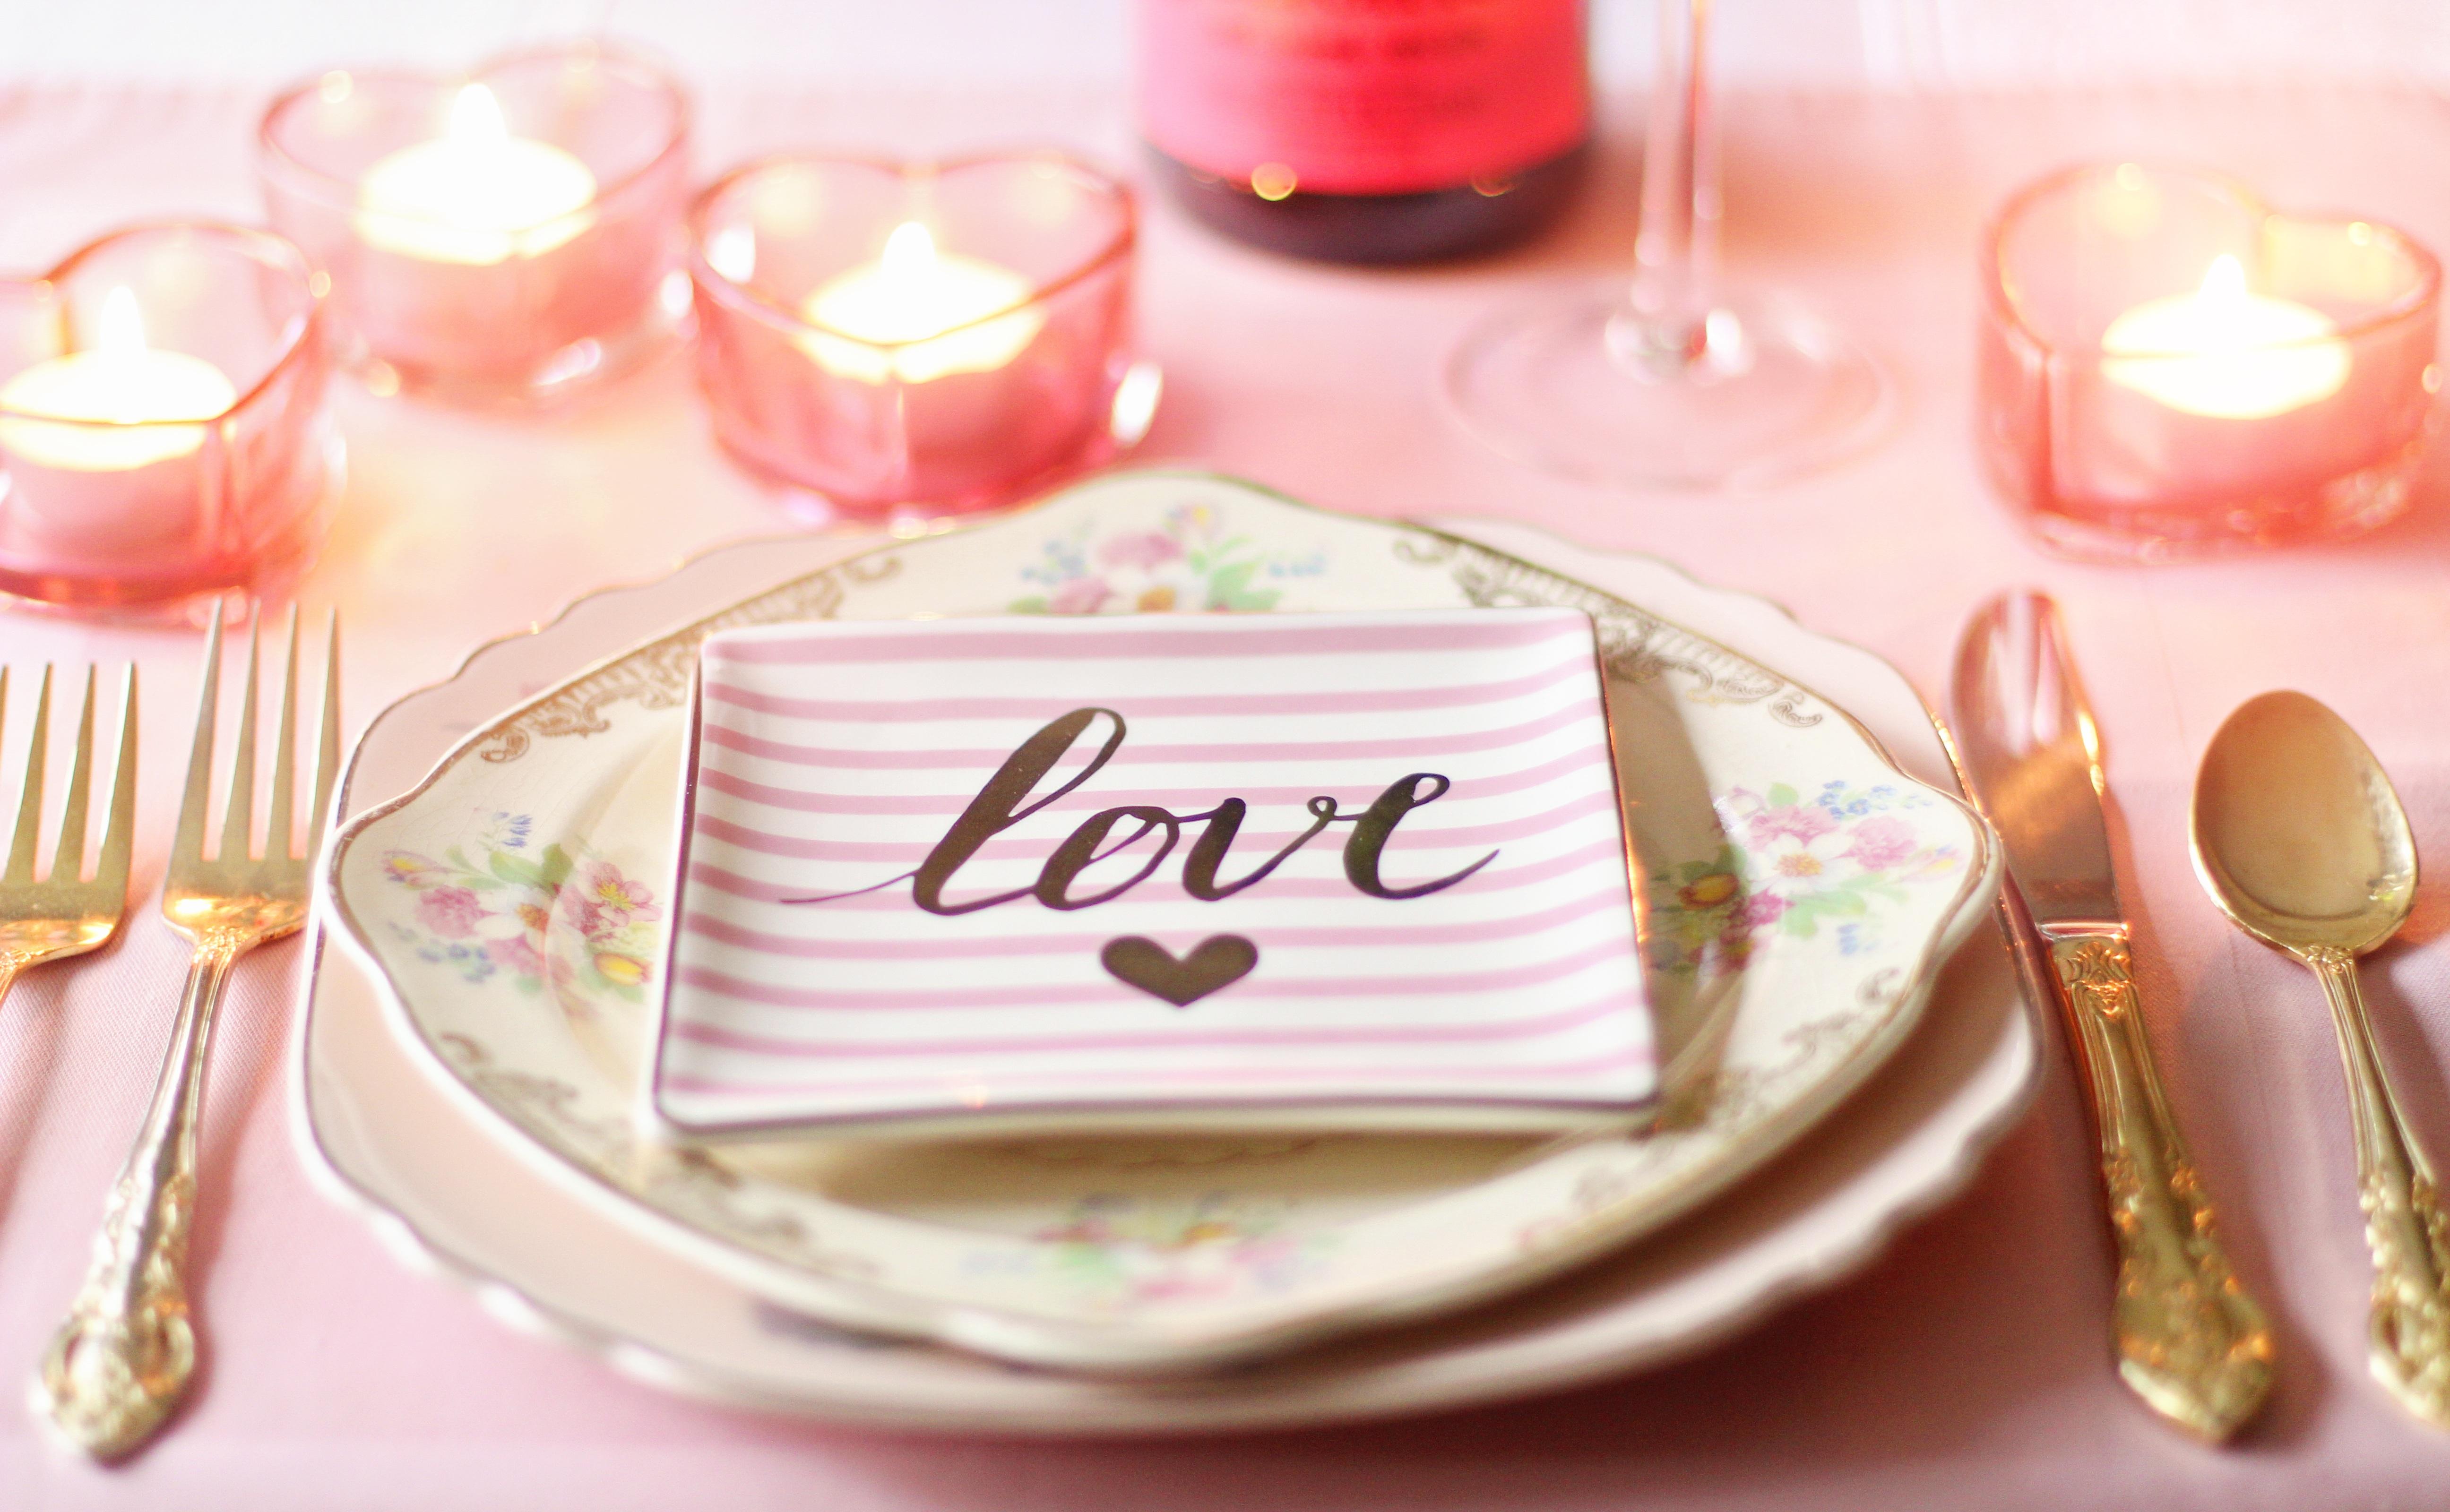 Fotos gratis : mano, mesa, tenedor, vendimia, flor, pétalo ...